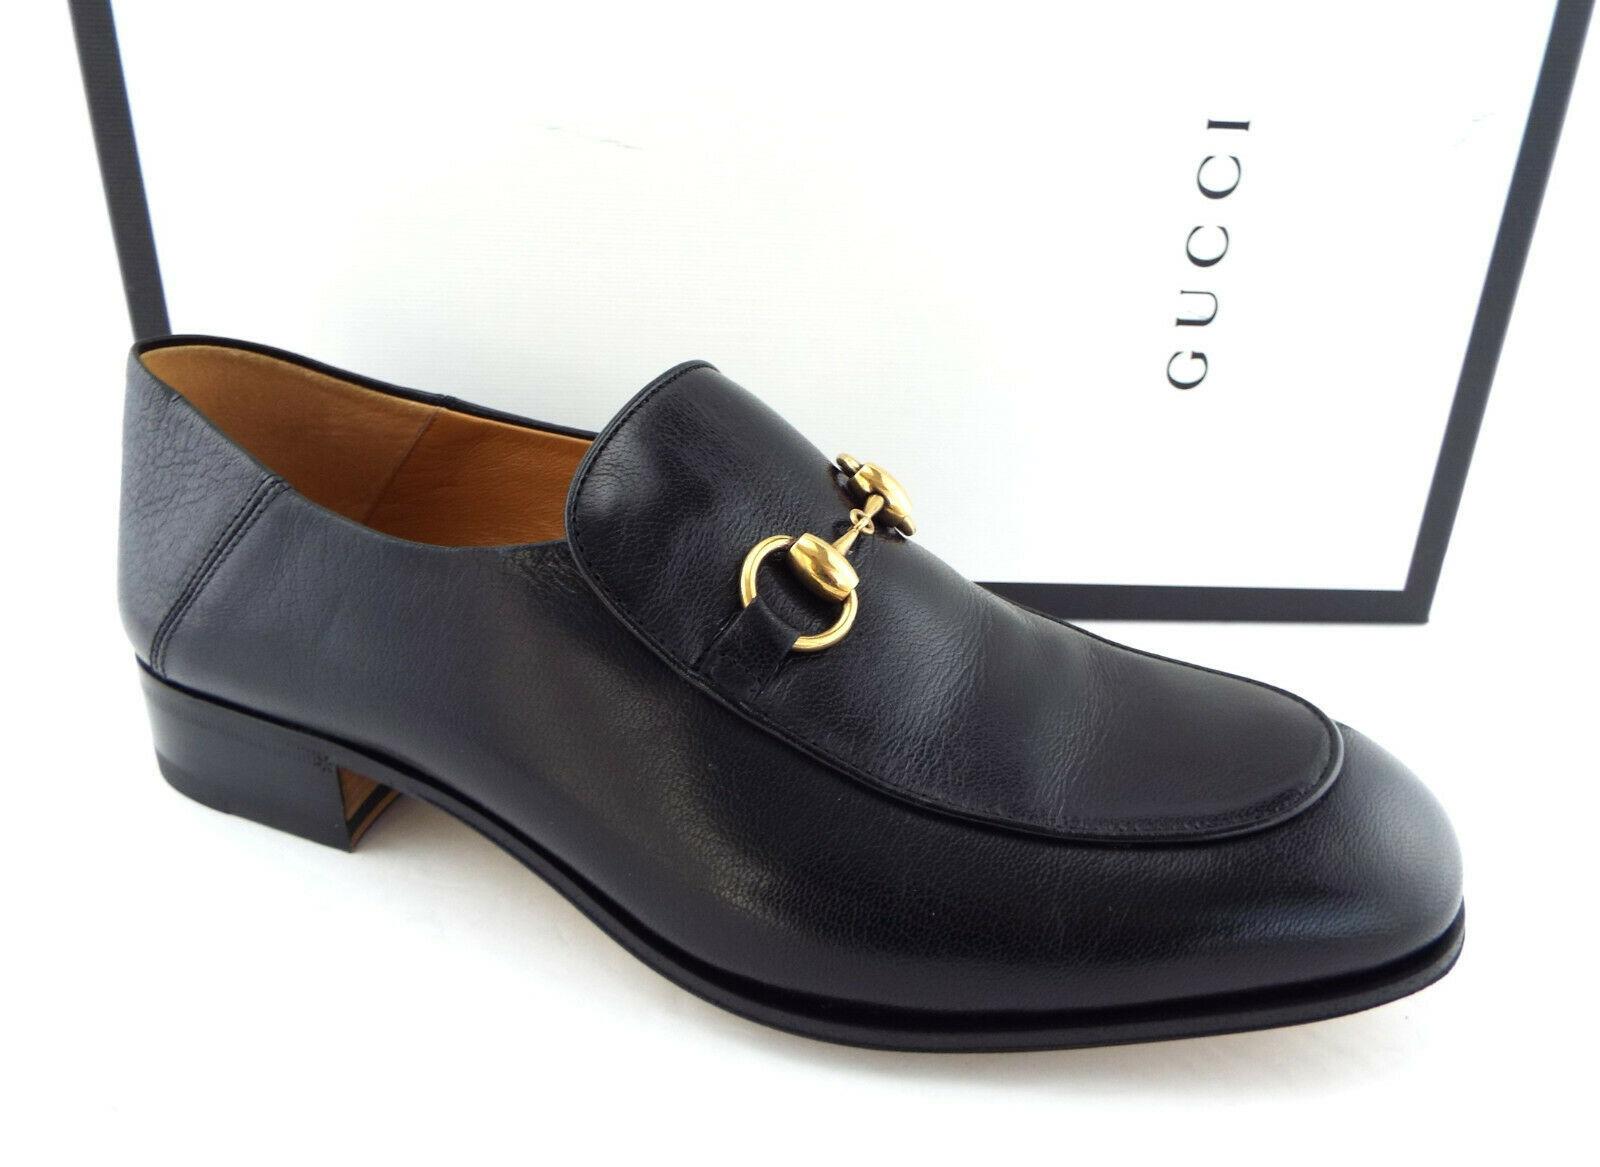 4959c3fbc73 New GUCCI Size 8.5 Black Horsebit and 50 similar items